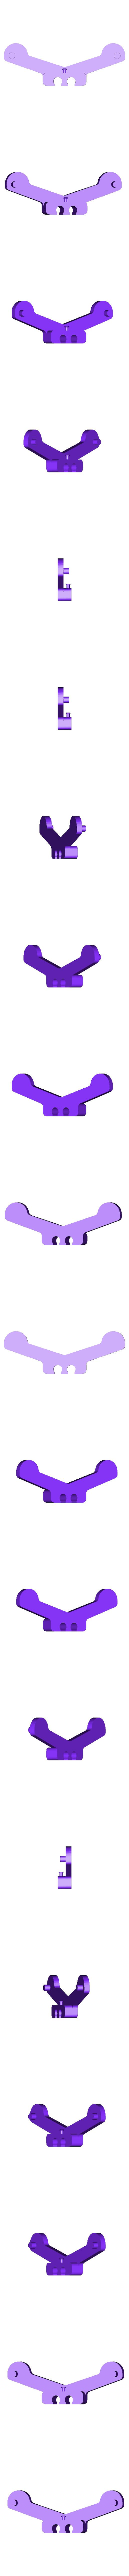 Slider.STL Download free STL file Sitting Spool mount w/Bearings and custom width • 3D printable template, csigshoj